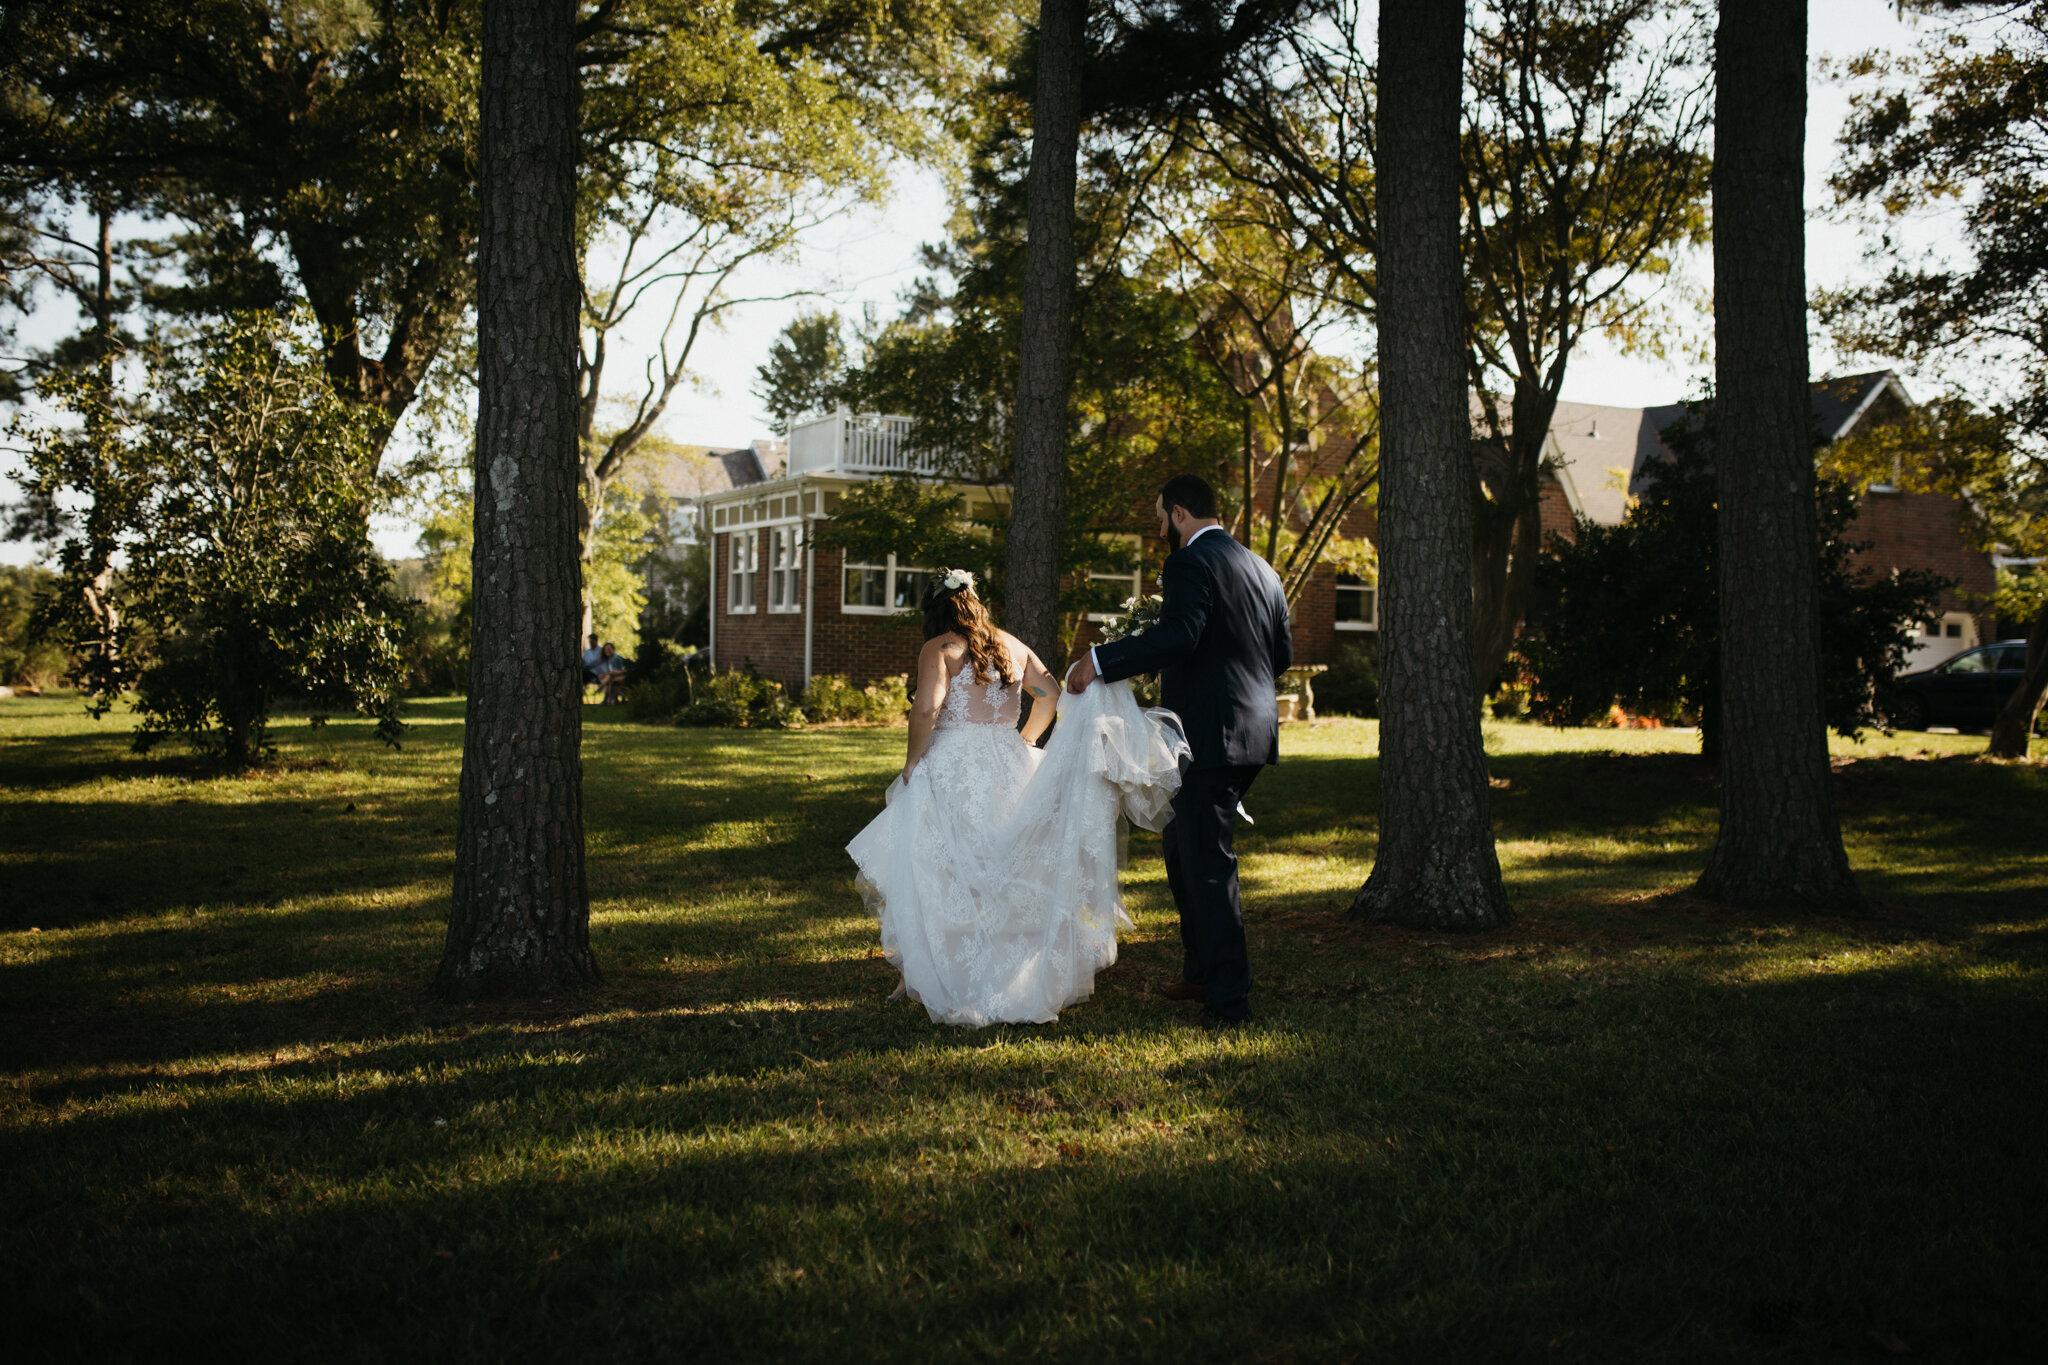 angela_jason_norfolk_wedding-62.jpg